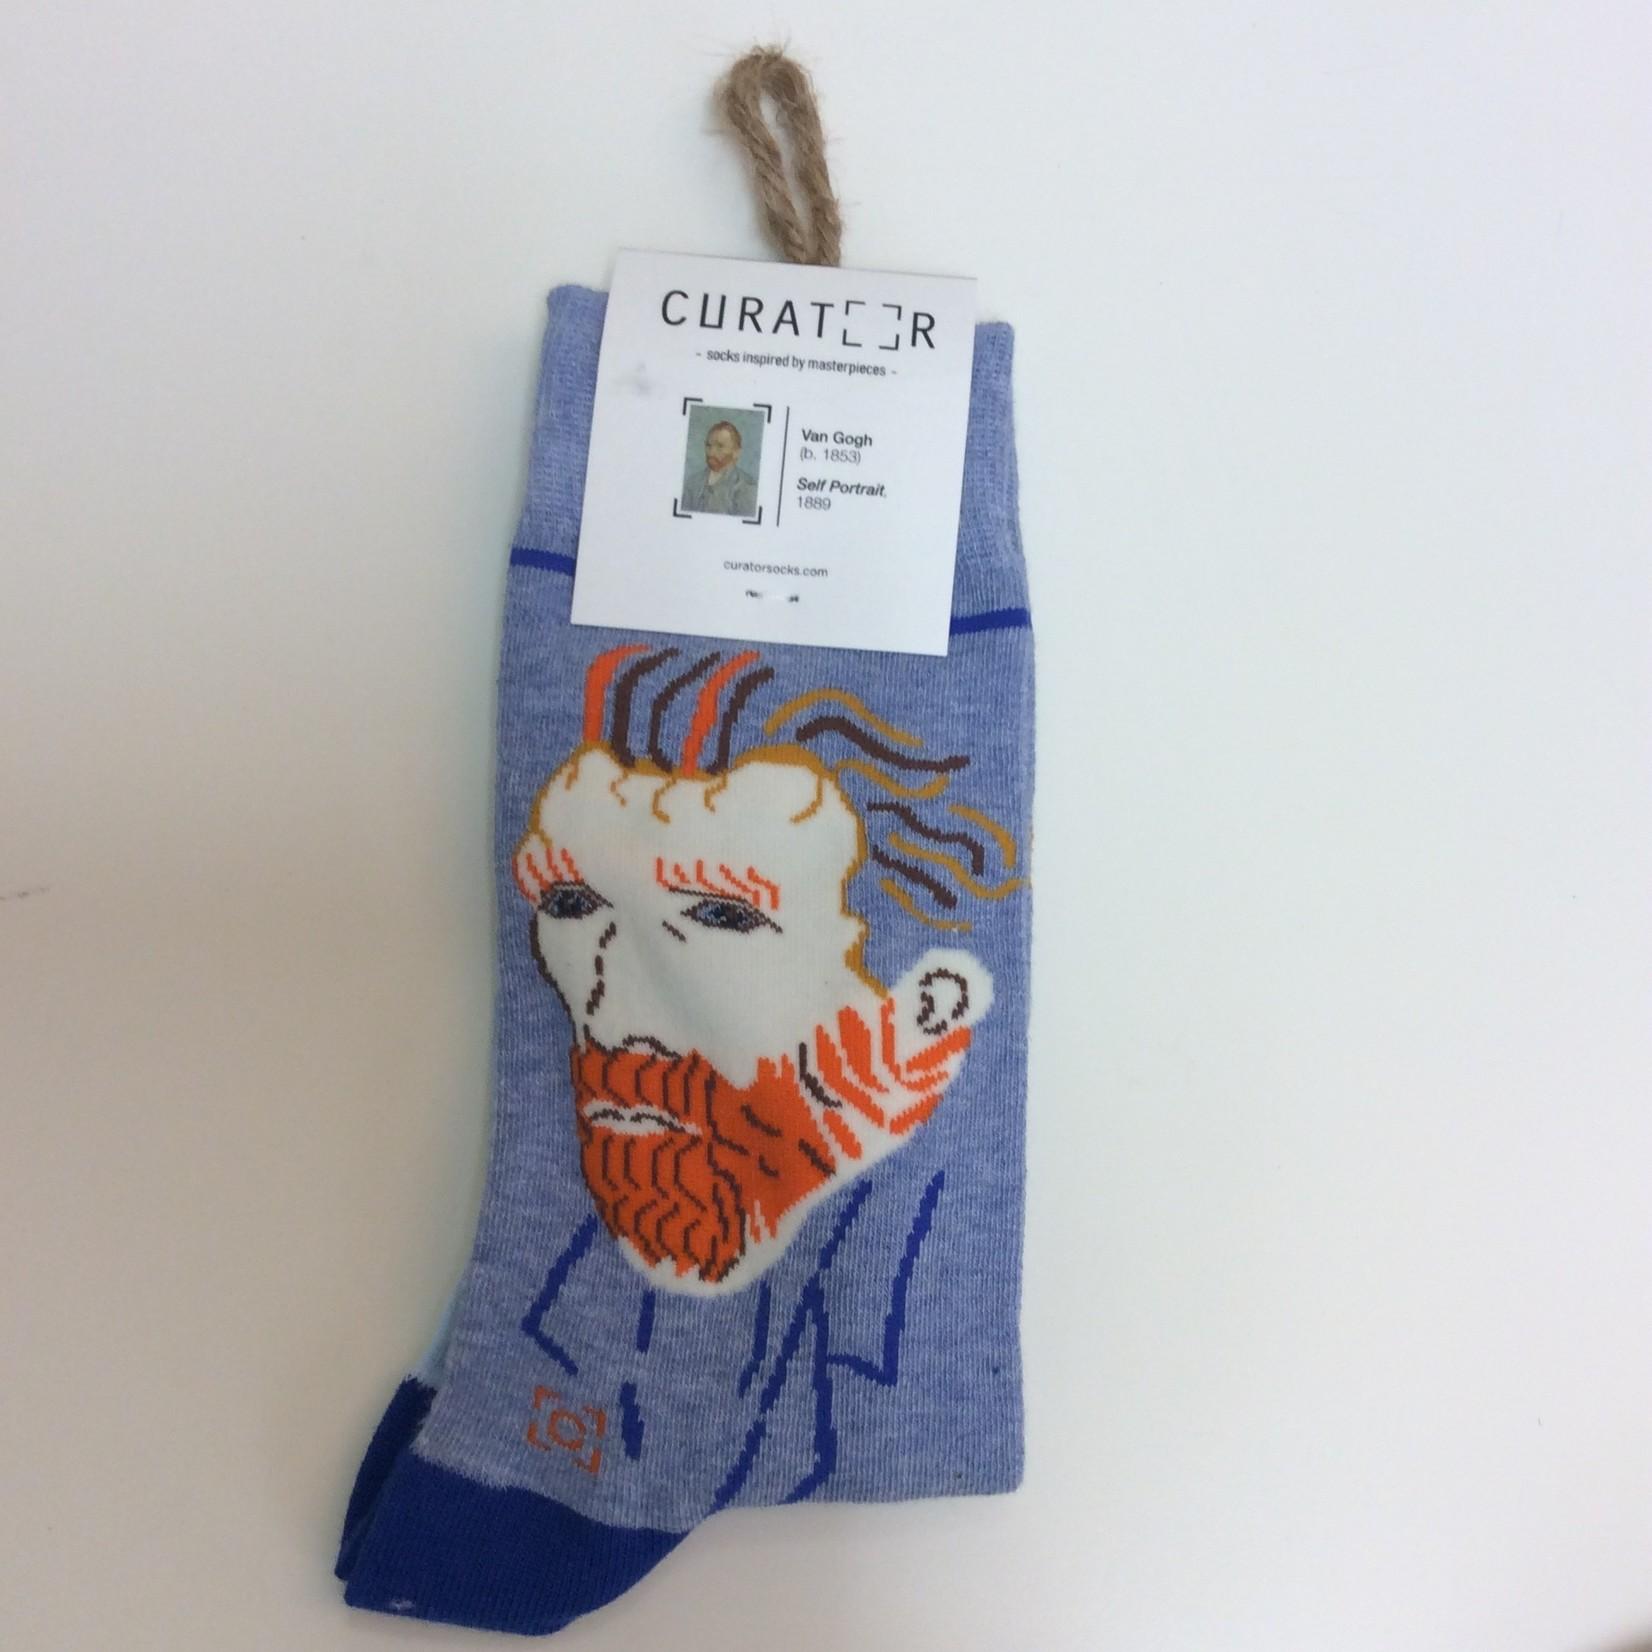 Curator Socks VAN GOGH SELF-PORTRAIT SOCKS